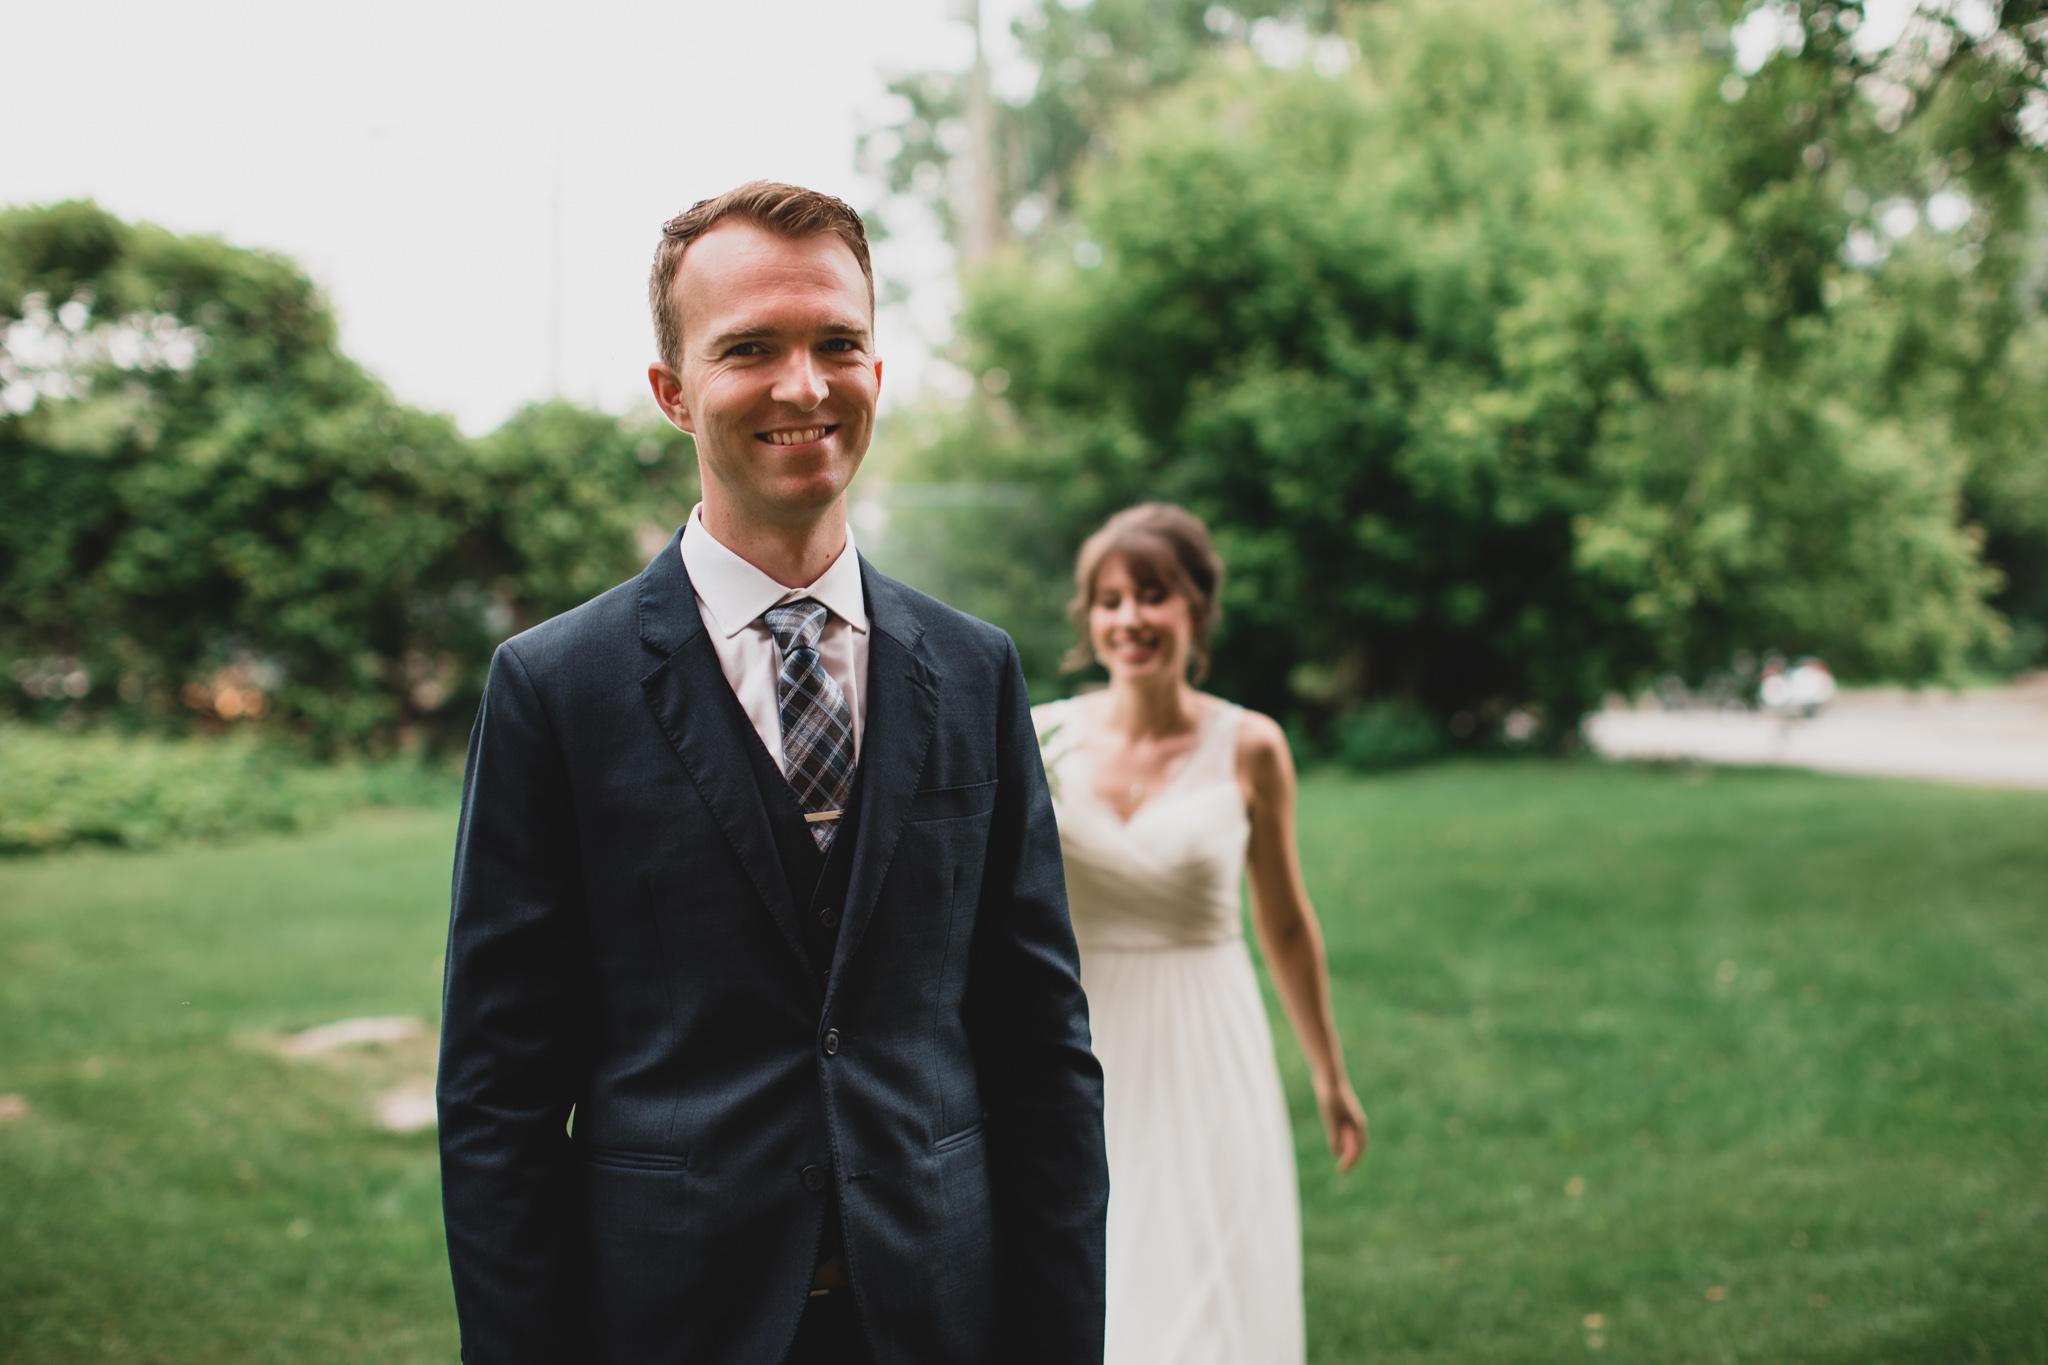 138-WEB-Jonathan-Kuhn-Photography-ClareConor-Wedding-6429.jpg